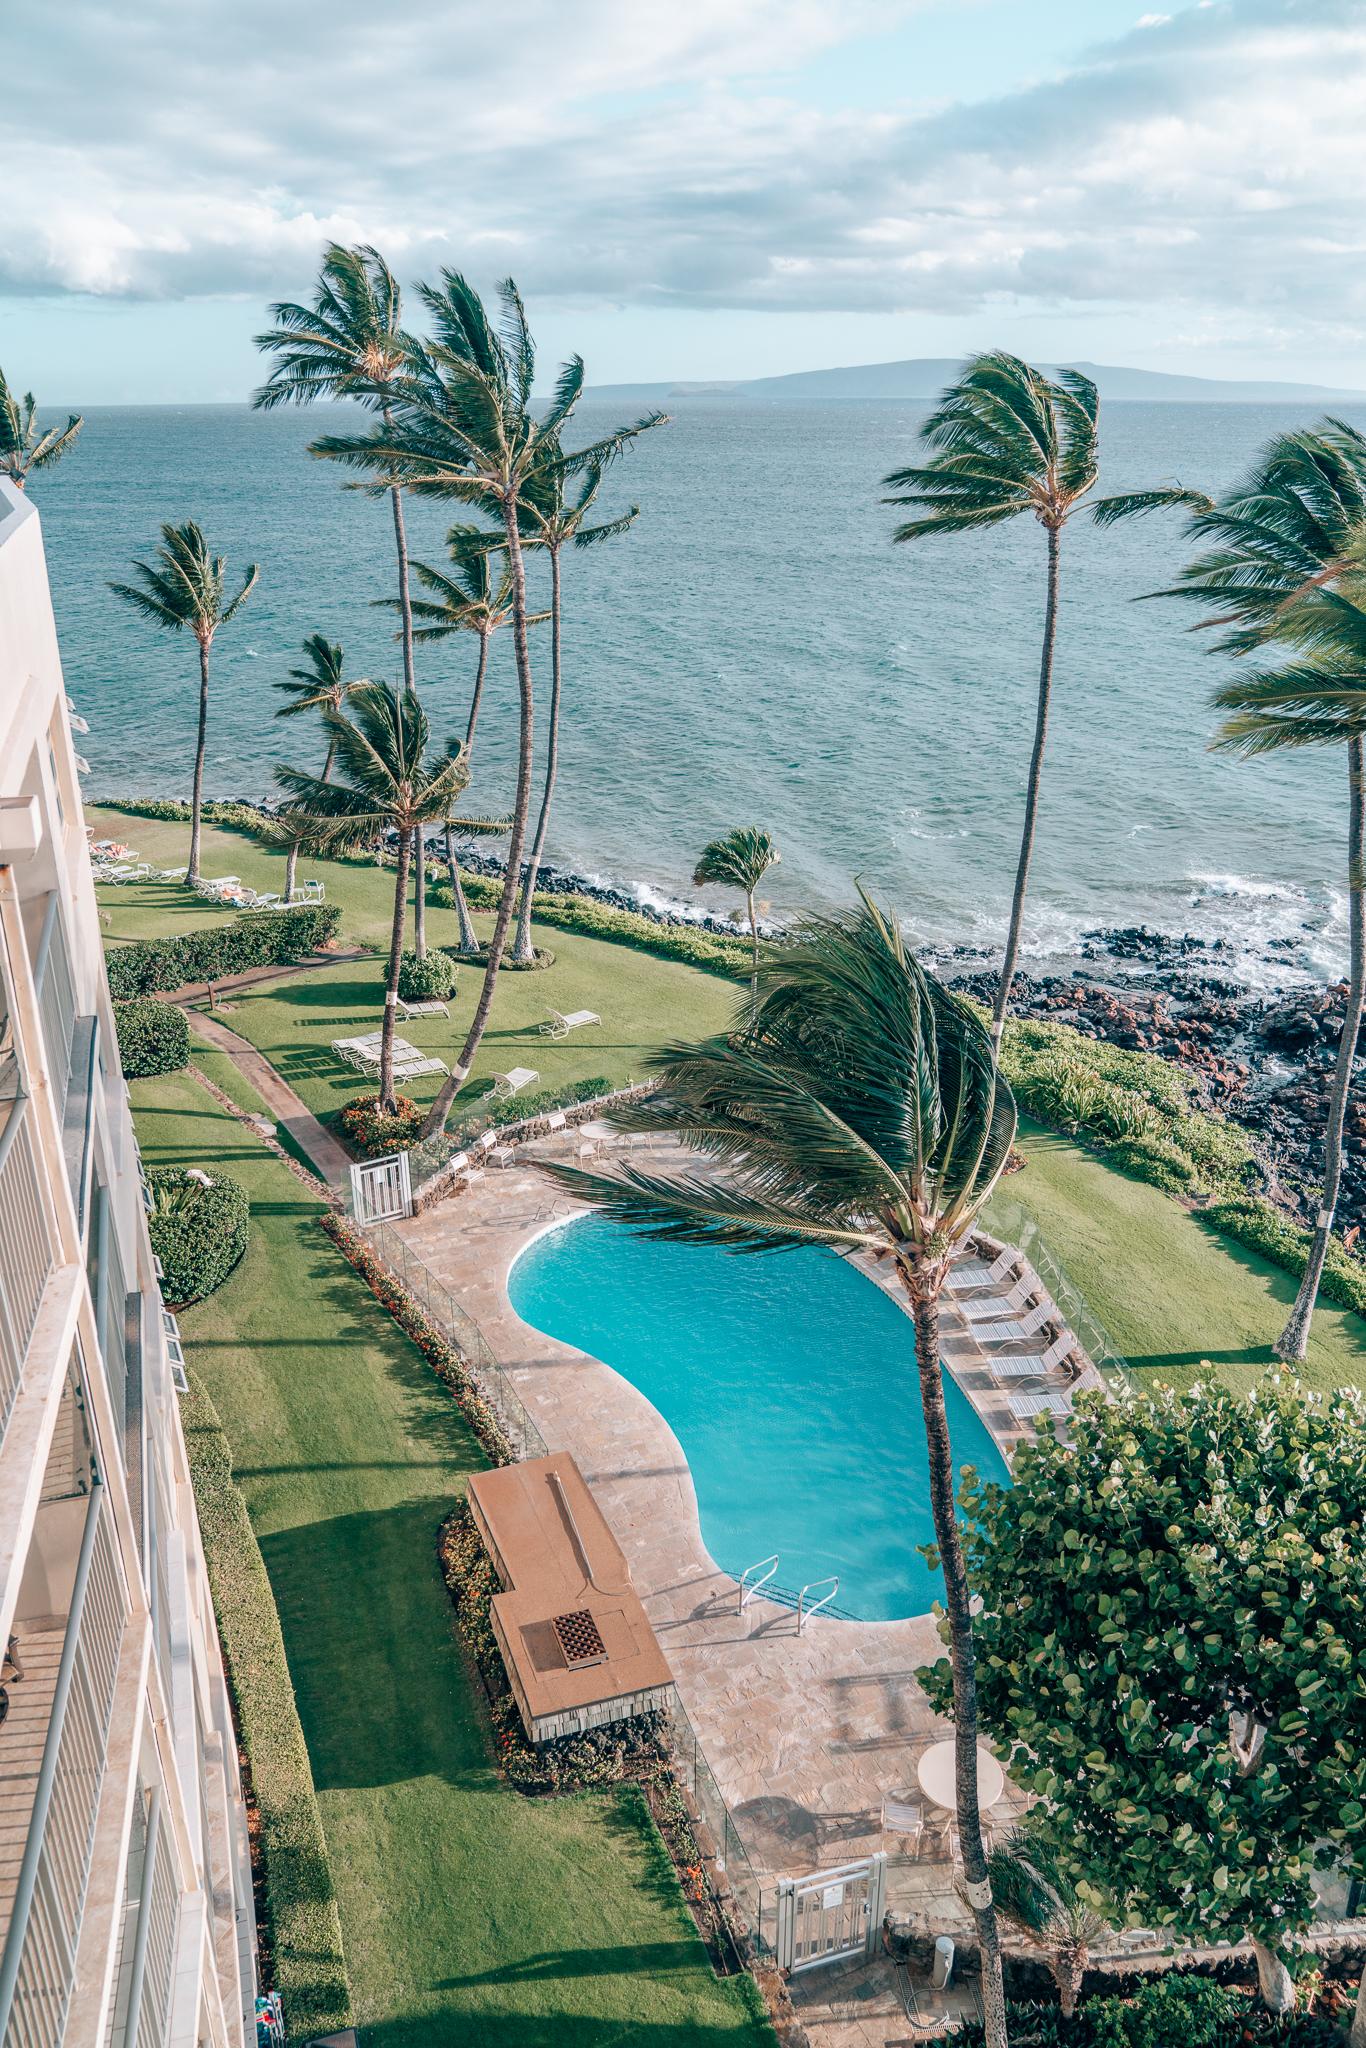 Pool Views at Maui Beachside